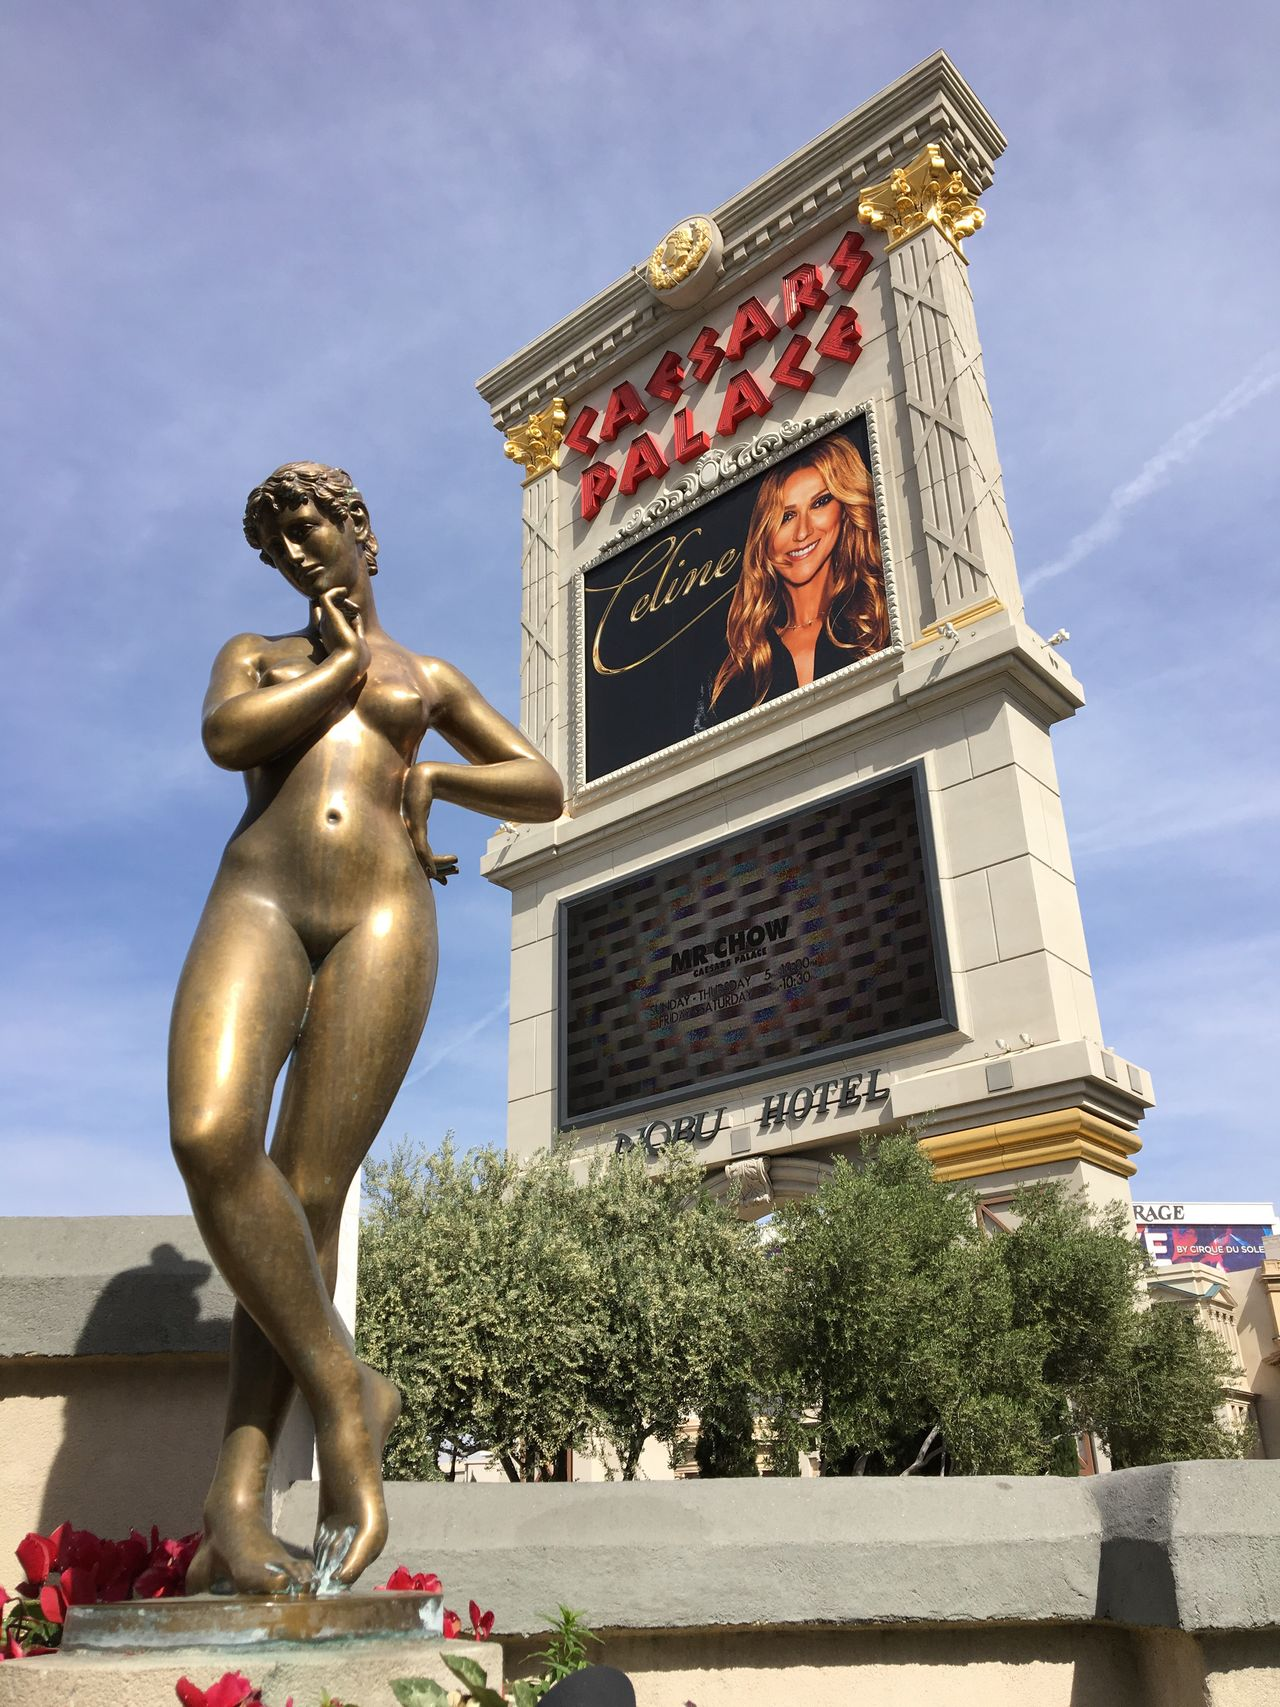 Great memories there… ;-) Justsaying Las Vegas